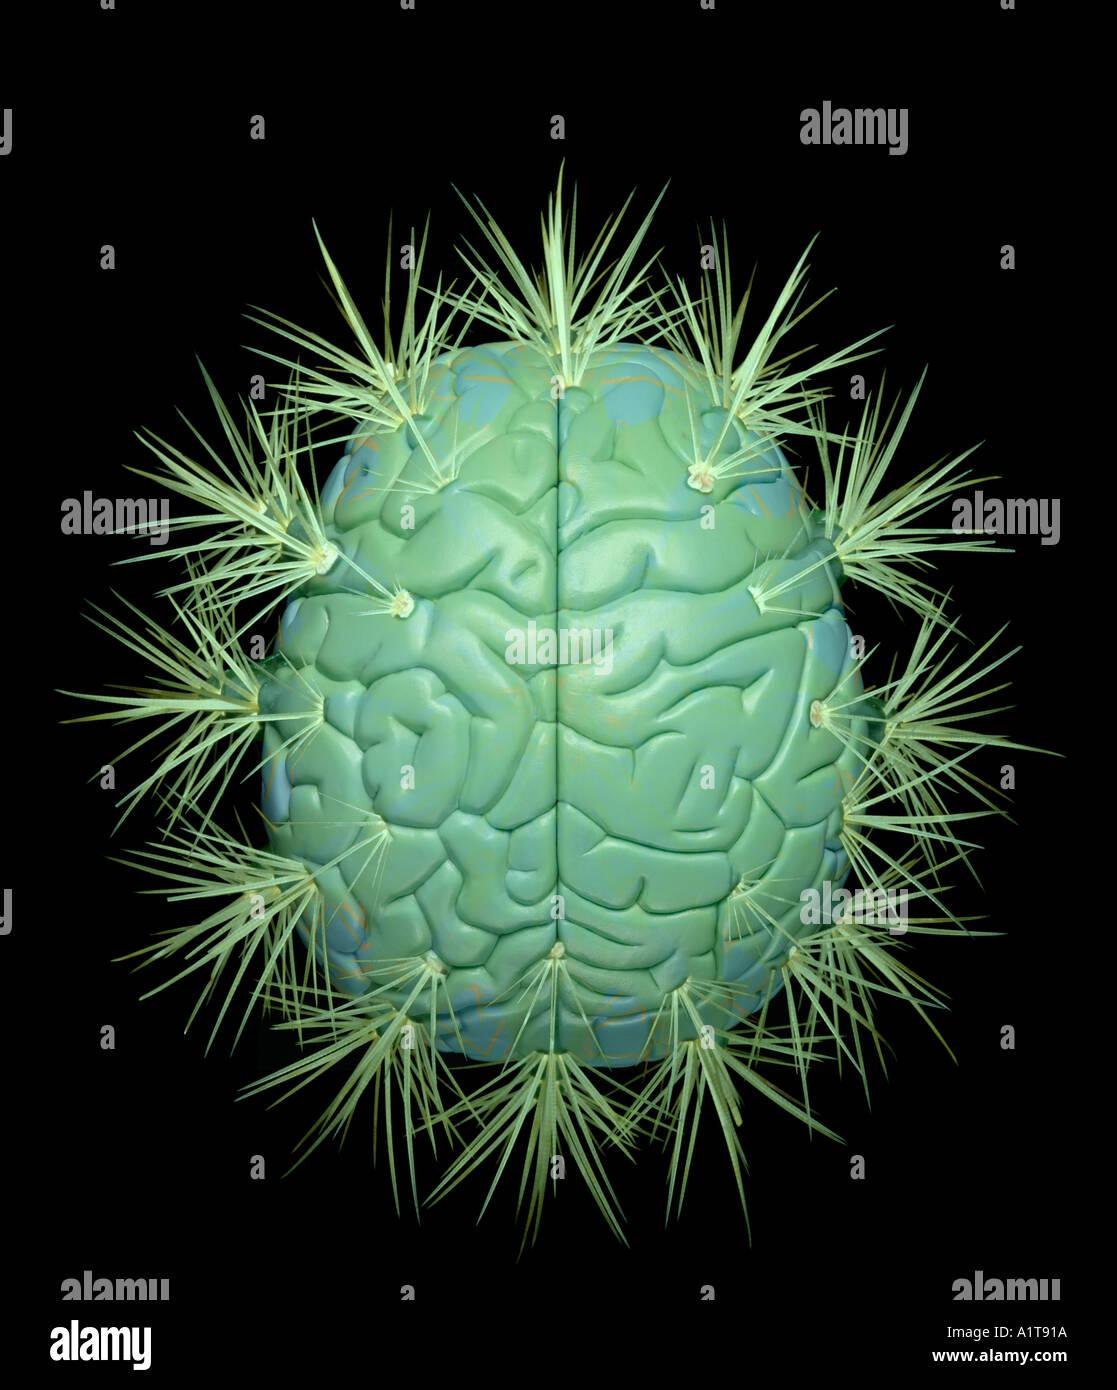 Human Brain with cactus thorns - Stock Image